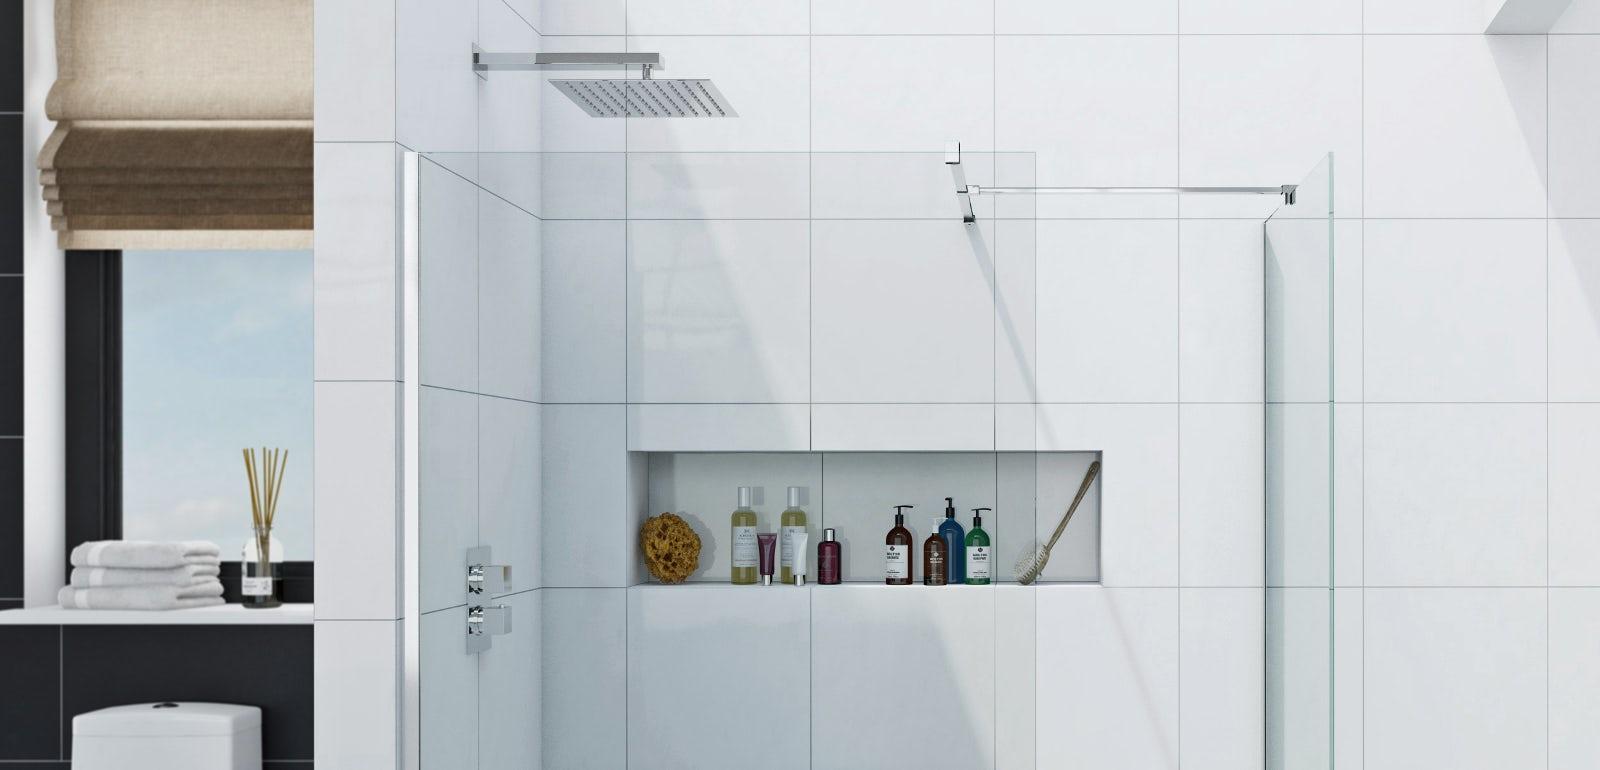 Best Kitchen Gallery: 3d Design Software Planning Victoriaplum of 3d Bathroom Design  on rachelxblog.com